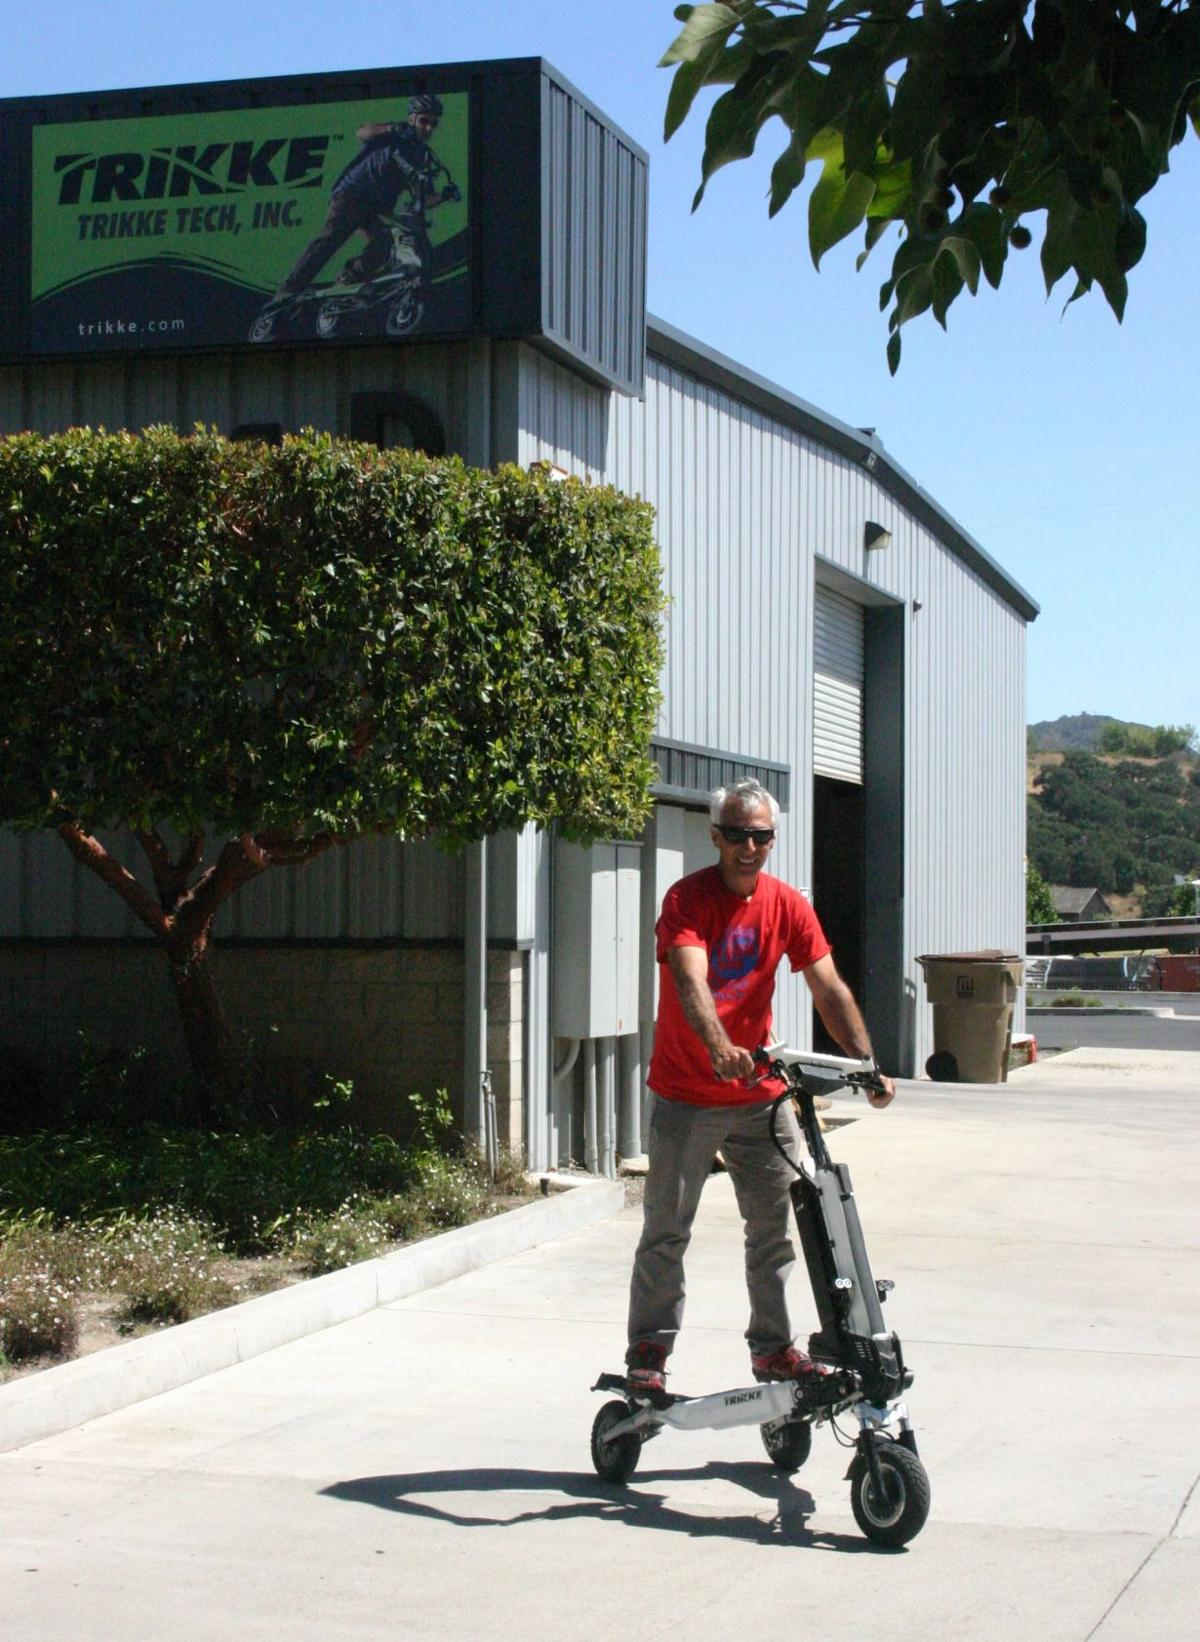 Gildo Beleski at new Trikke Tech location